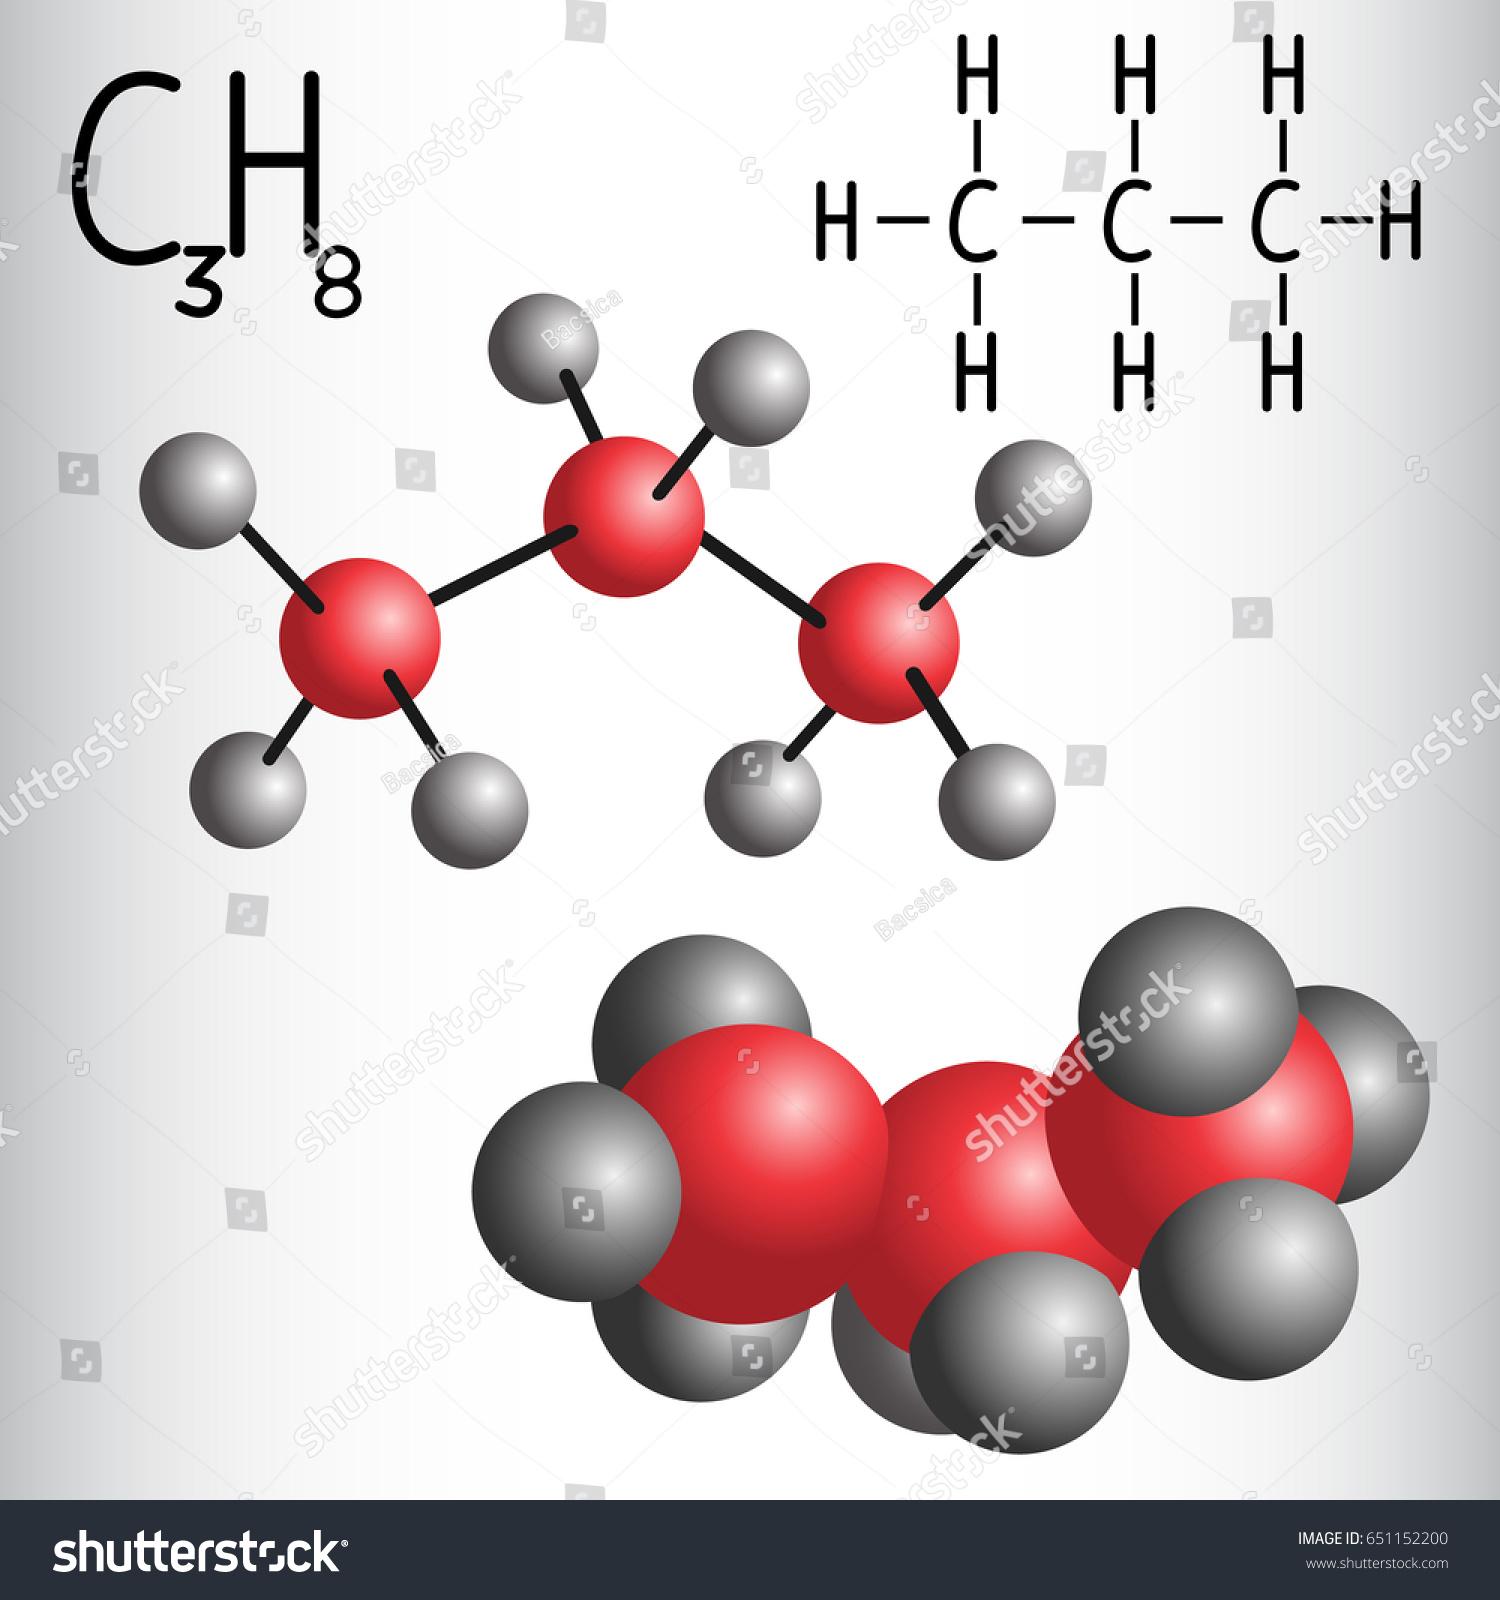 Chemical Formula Molecule Model Propane C 3 H 8 Stock Vector